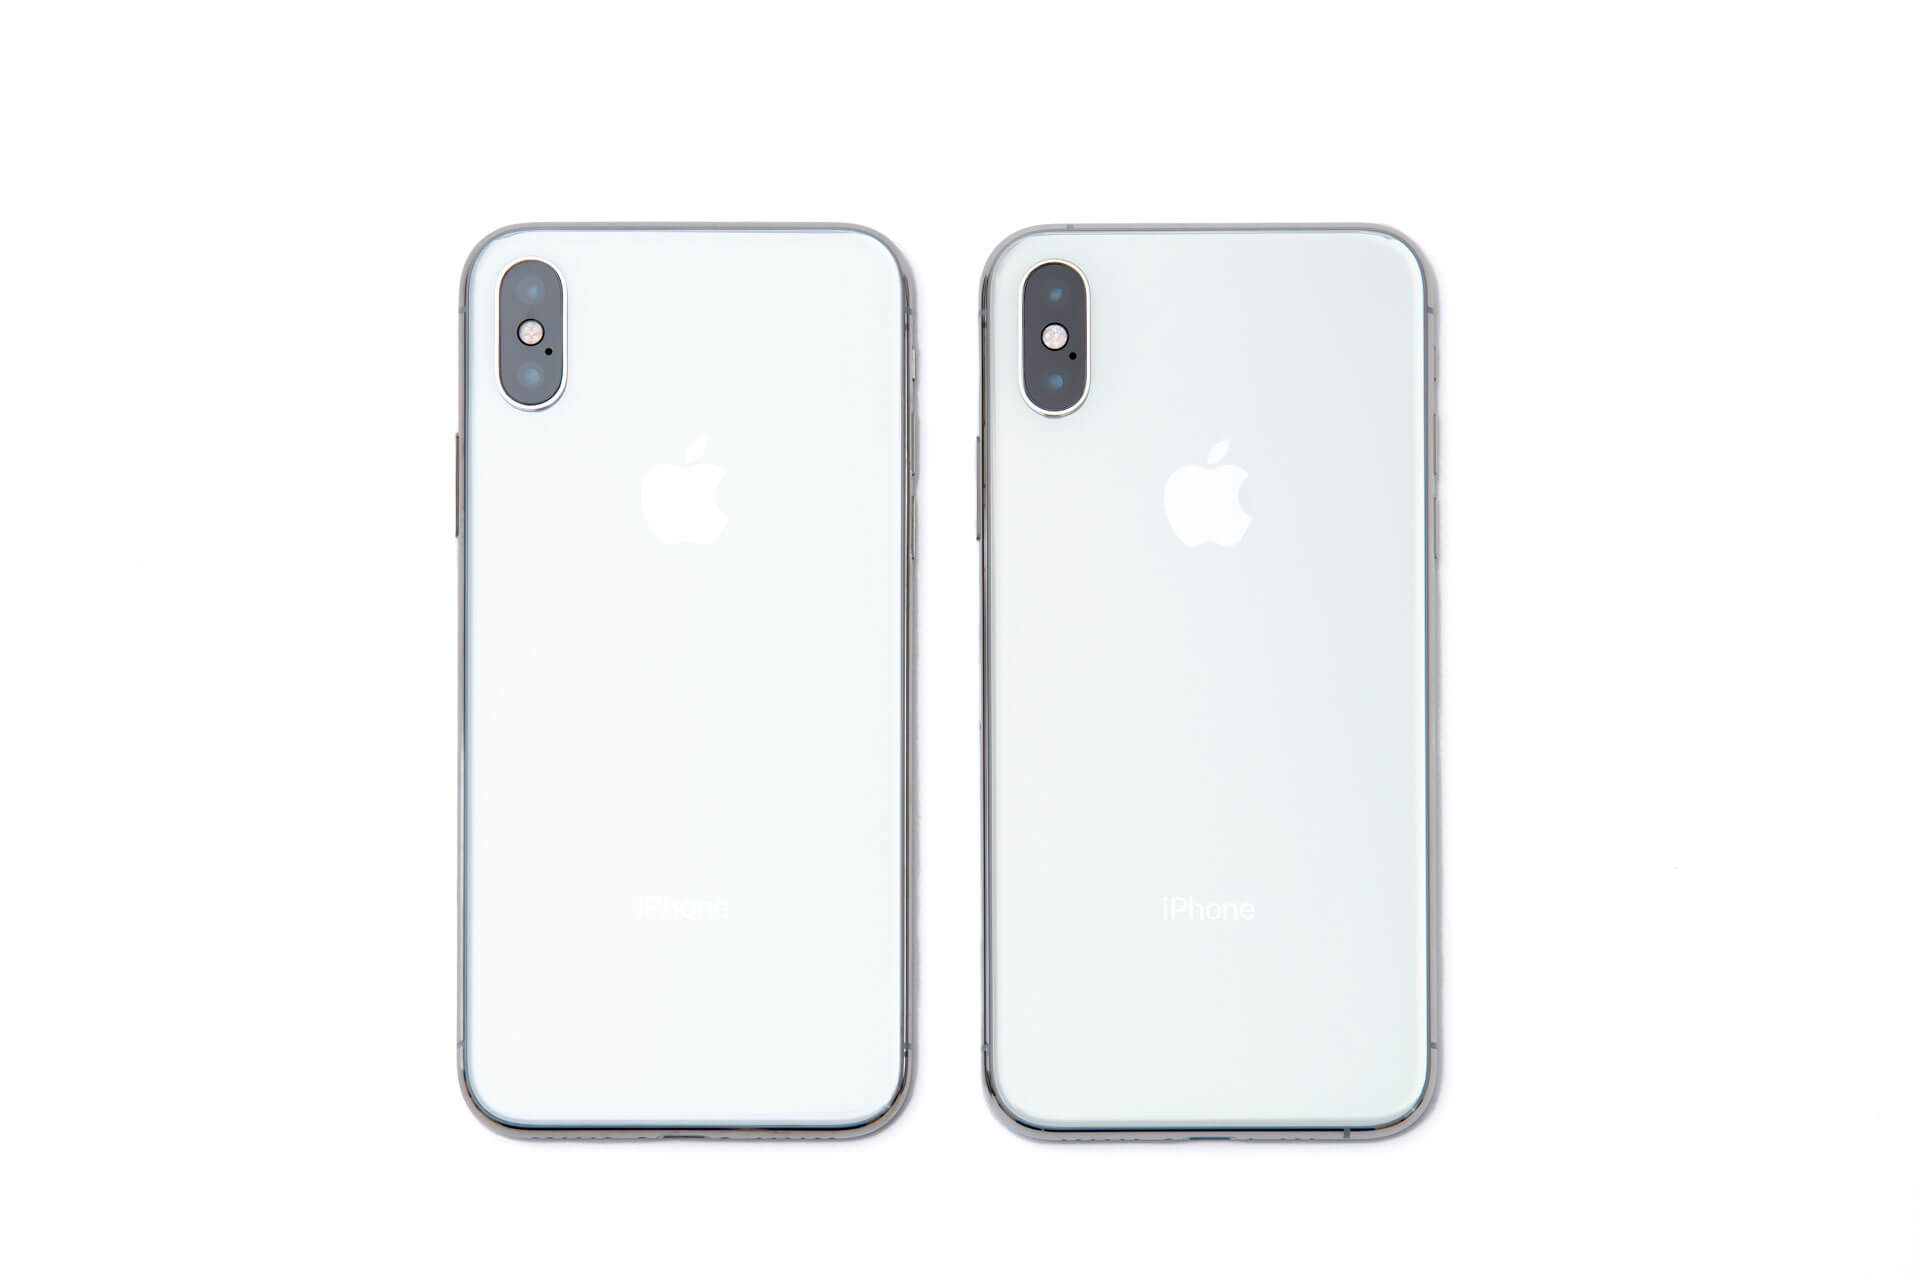 iPhone XS iPhone 外観比較 背面